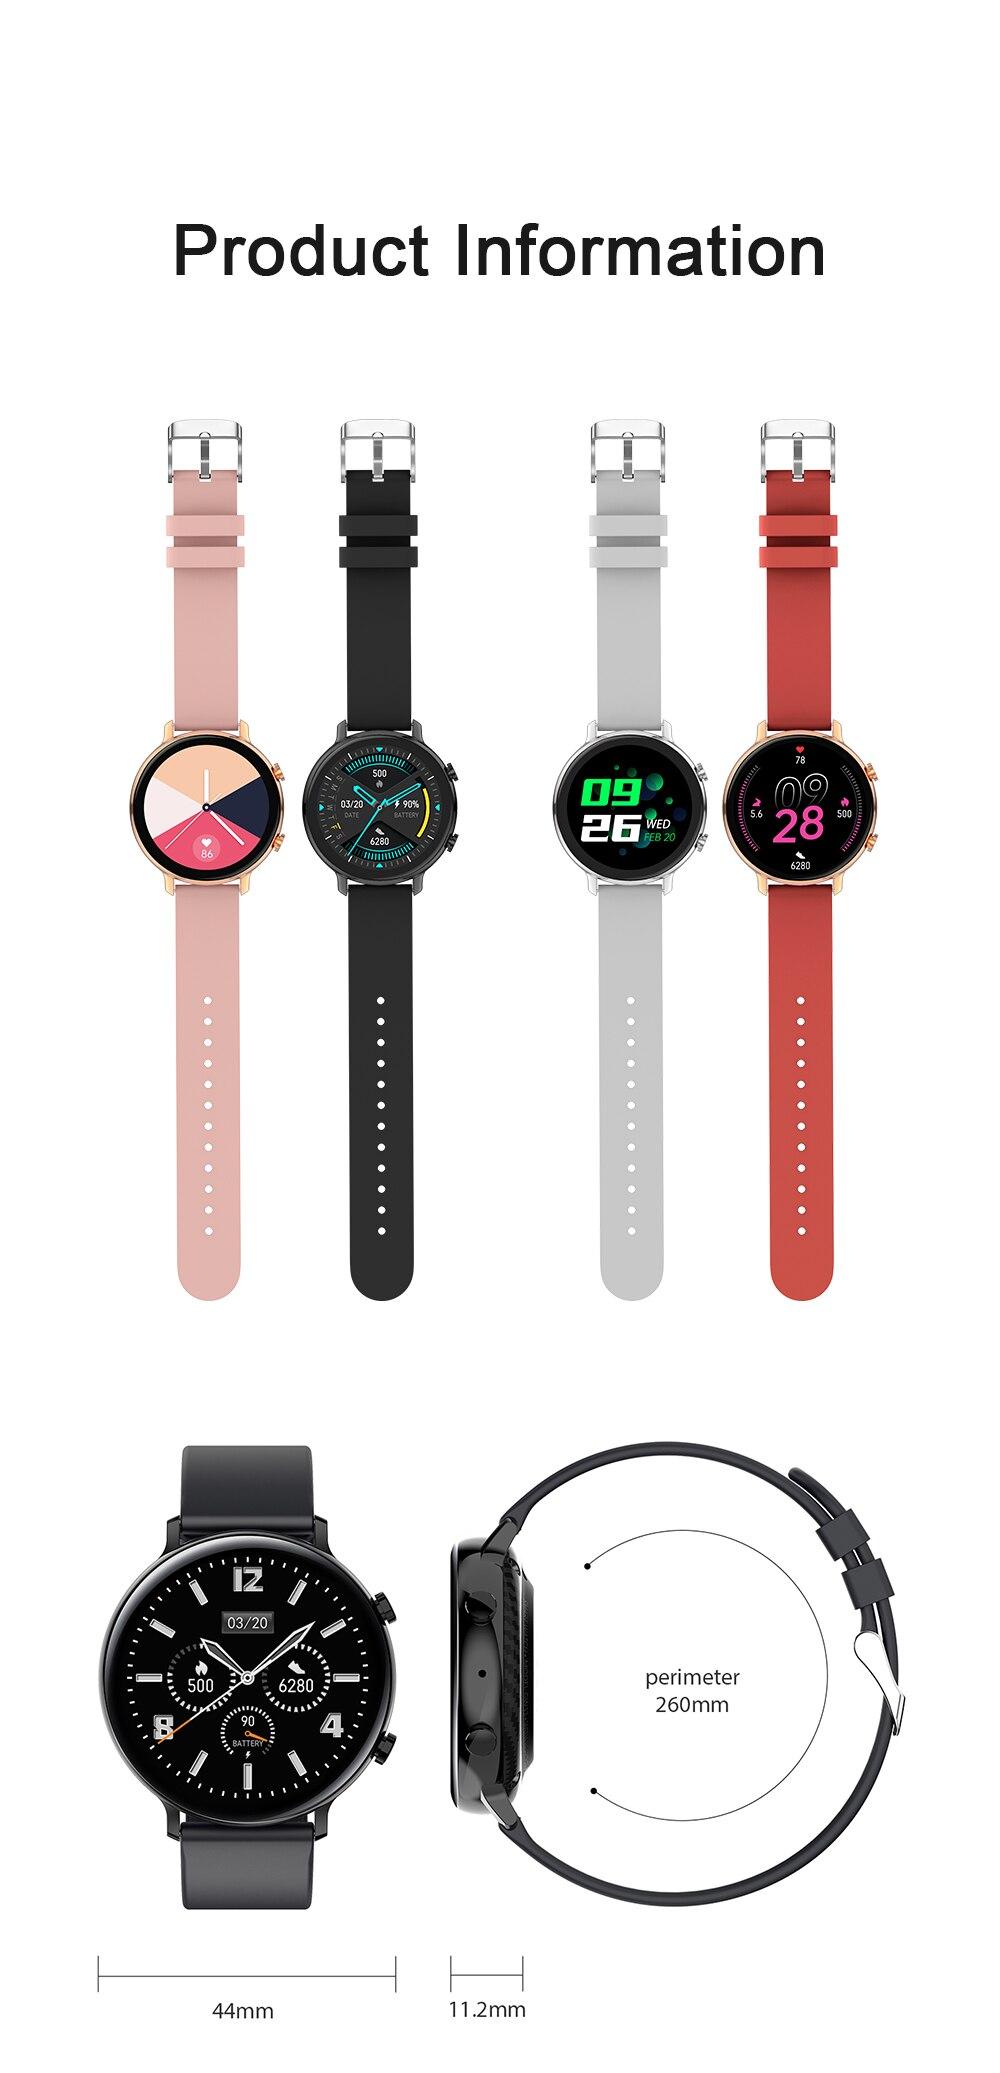 Hbc0835778e864e85ac6572e600e5402cT SANLEPUS 2021 Smart Watch Dial Calls Men Women Waterproof Smartwatch ECG PPG Fitness Bracelet Band For Android Apple Xiaomi